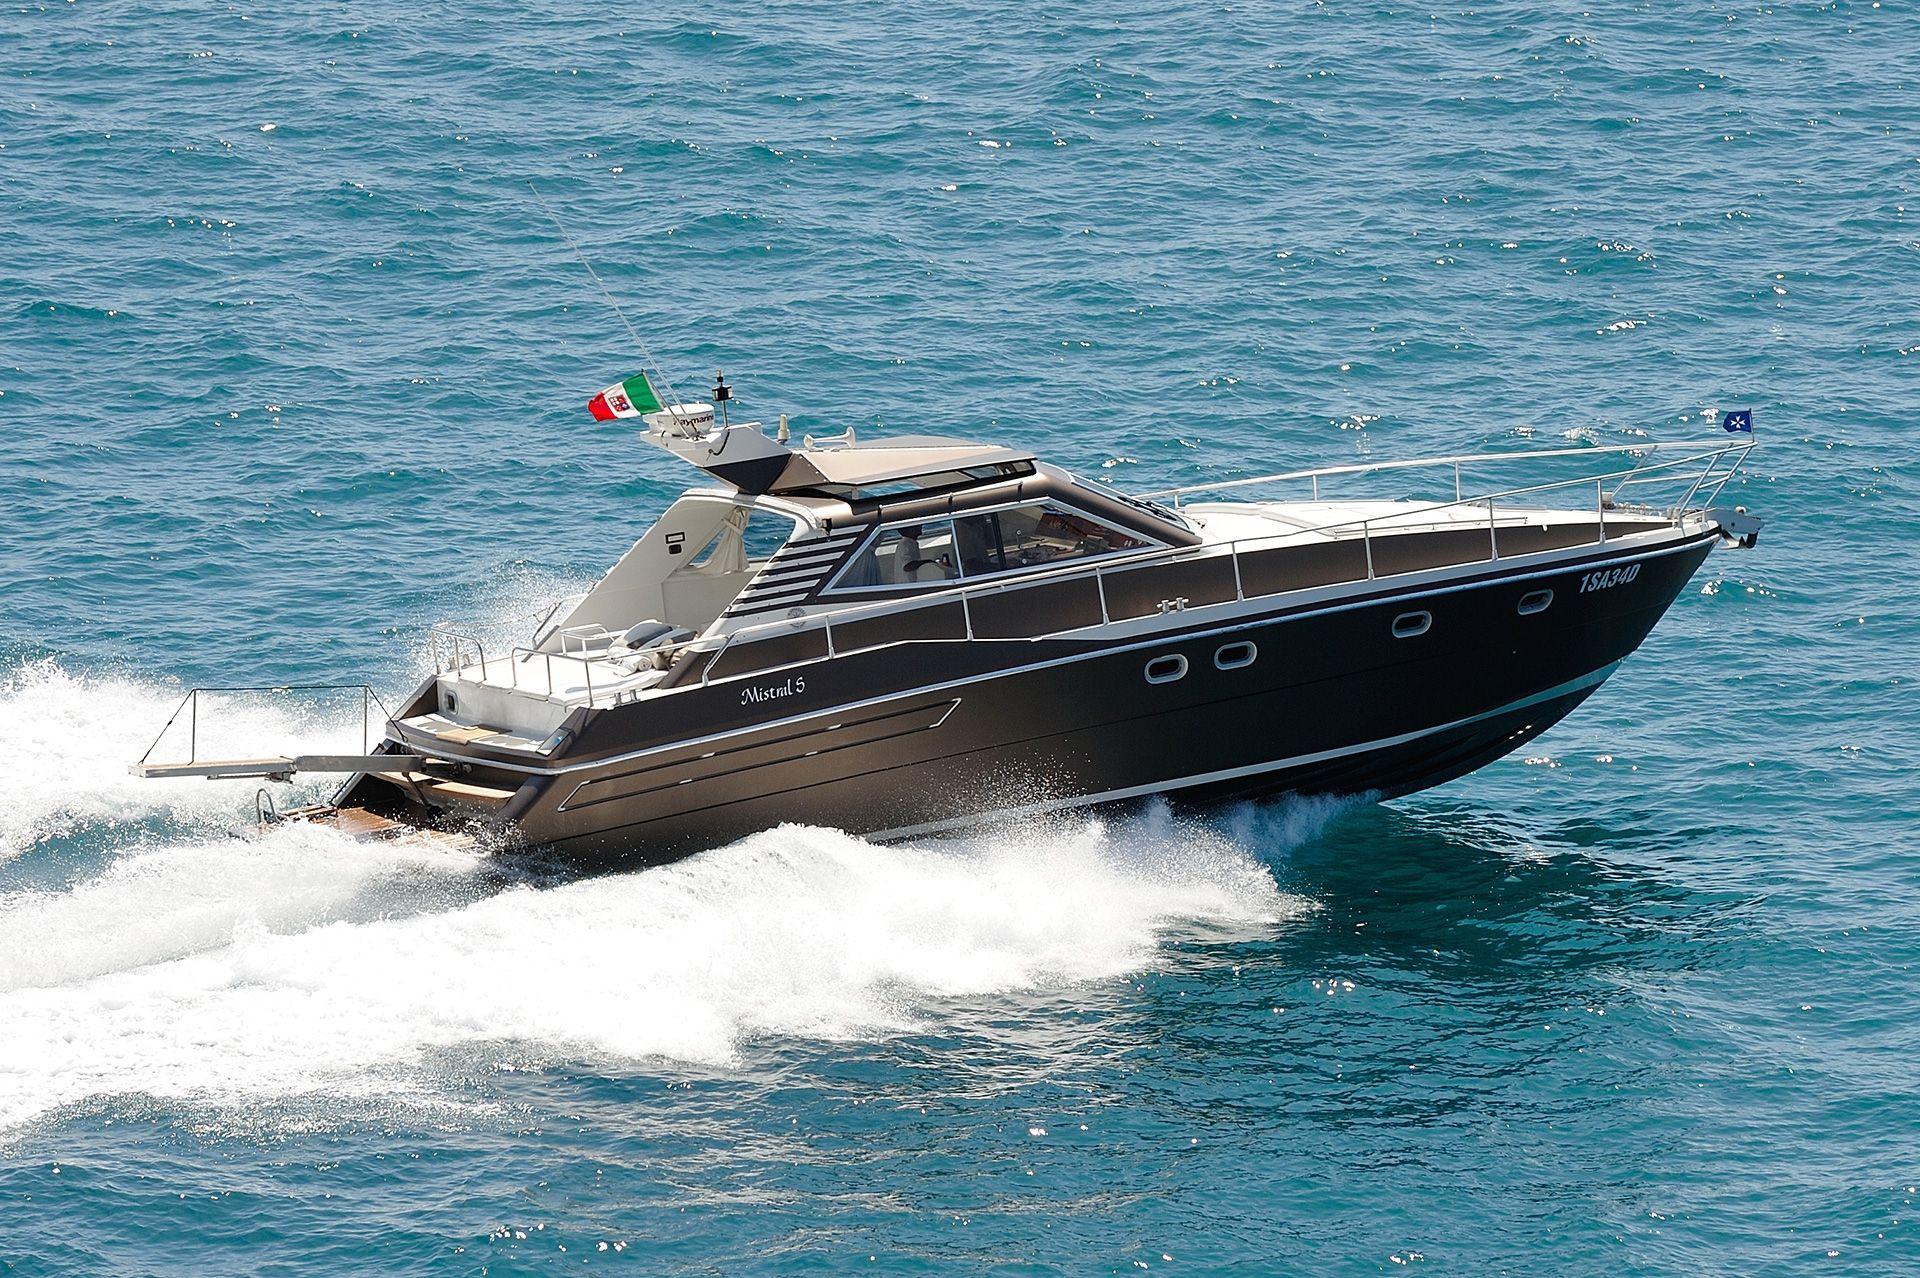 FURORE INN - Raffaelli Mistral S 47 - Day Charter Yacht - Positano - Amalfi Coast